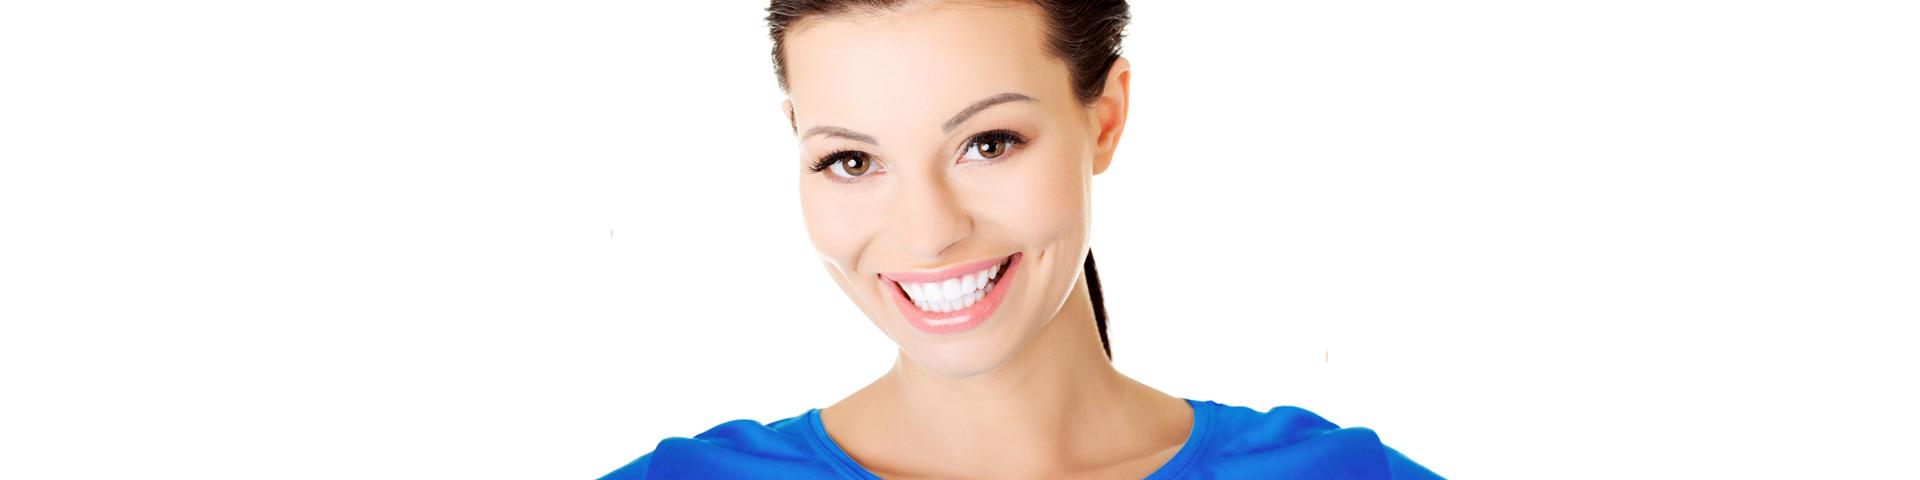 Dental Fluoride Treatment At Hermosa Dental